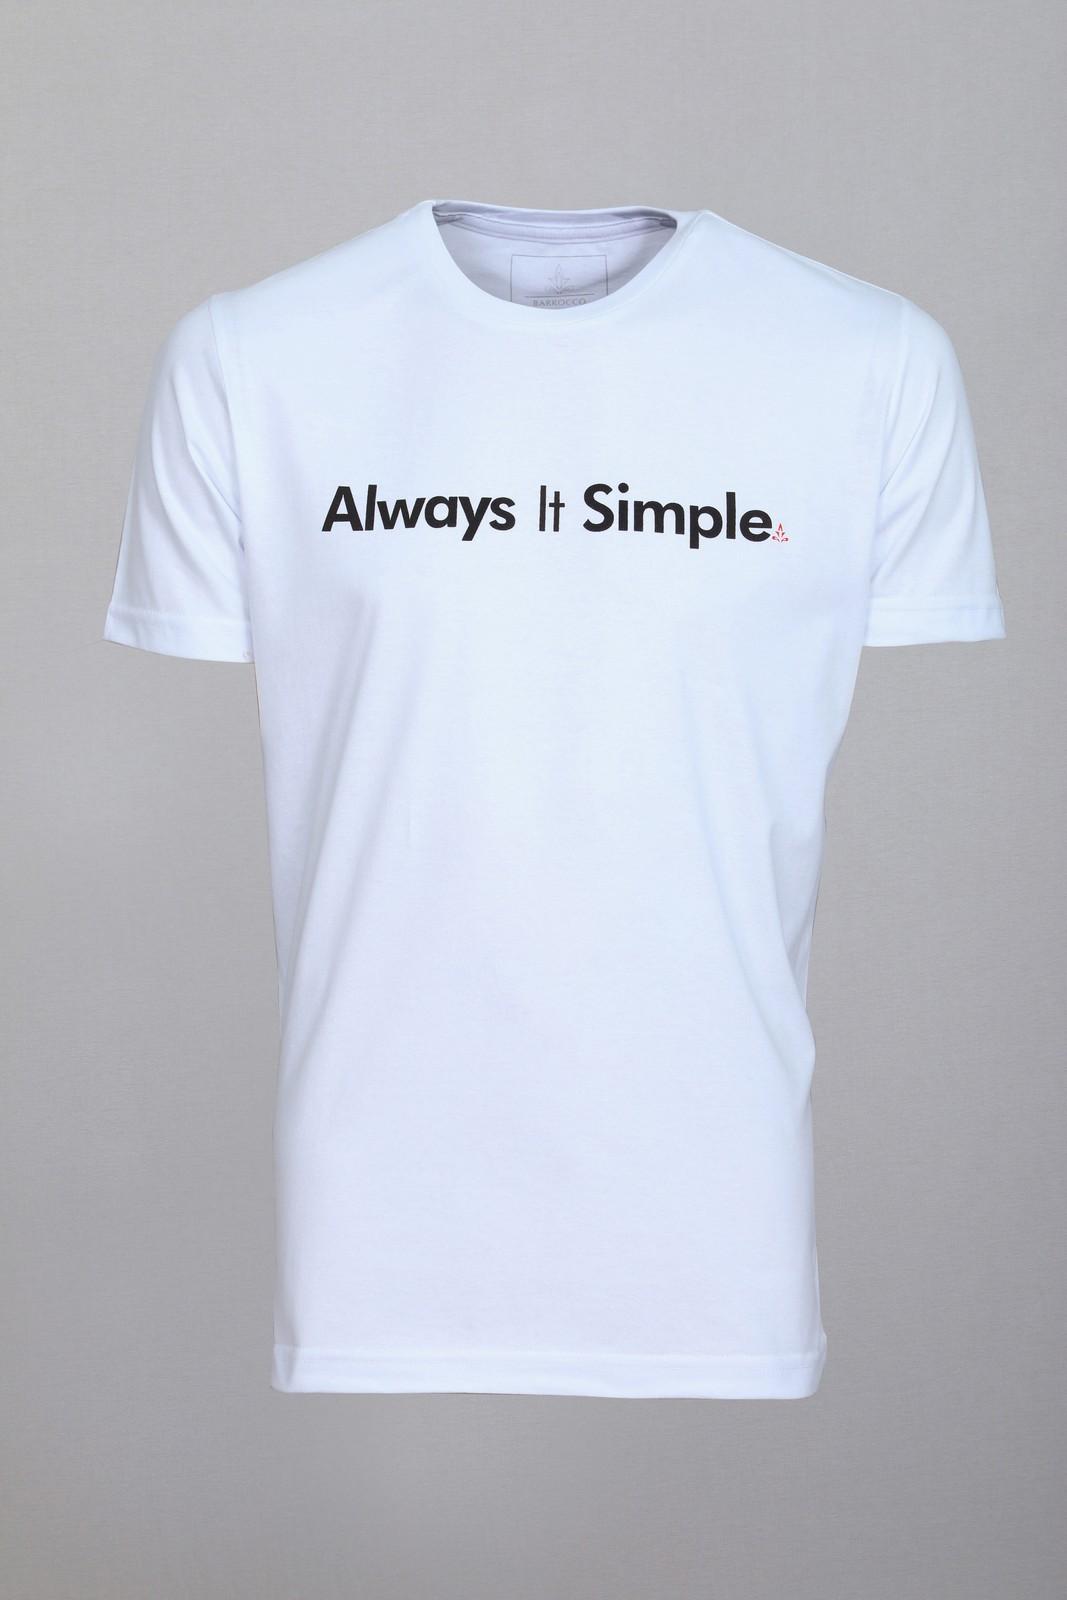 Camiseta Barrocco Always It Simple - FRETE GRÁTIS